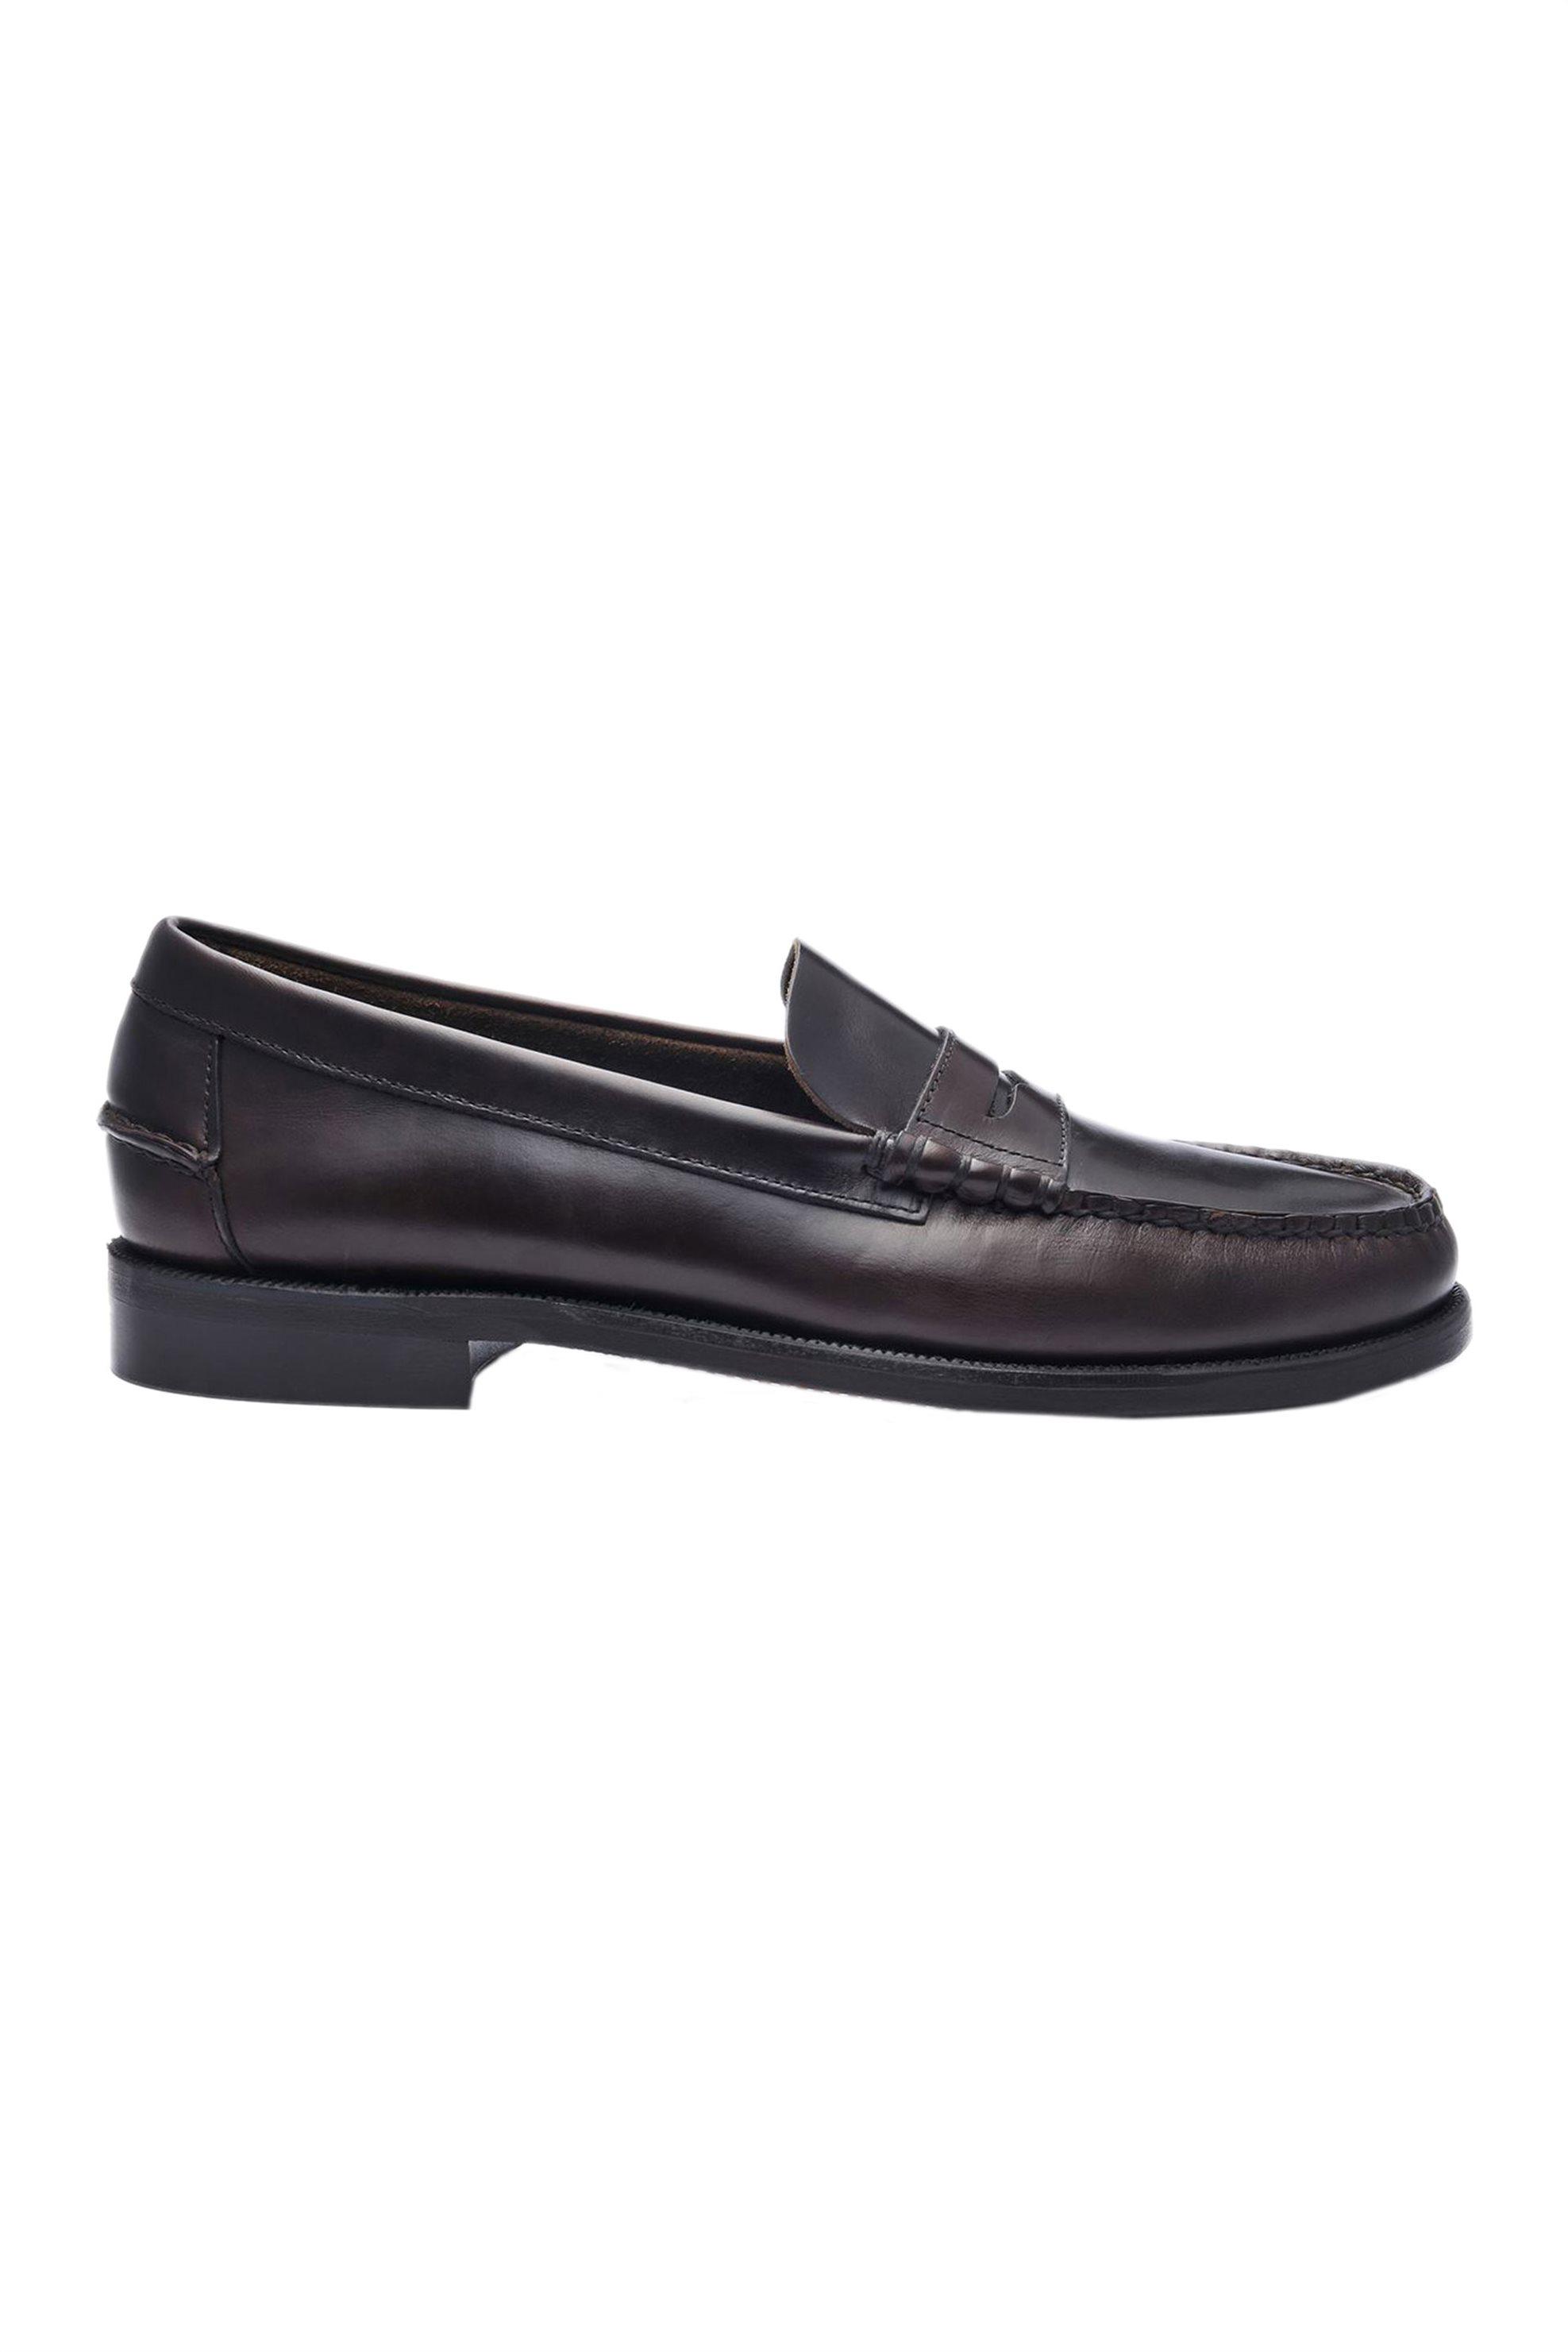 "Sebago® ανδρικά loafers δερμάτινα ""Classic Dan Waxy"" – L7000310-901W – Καφέ"